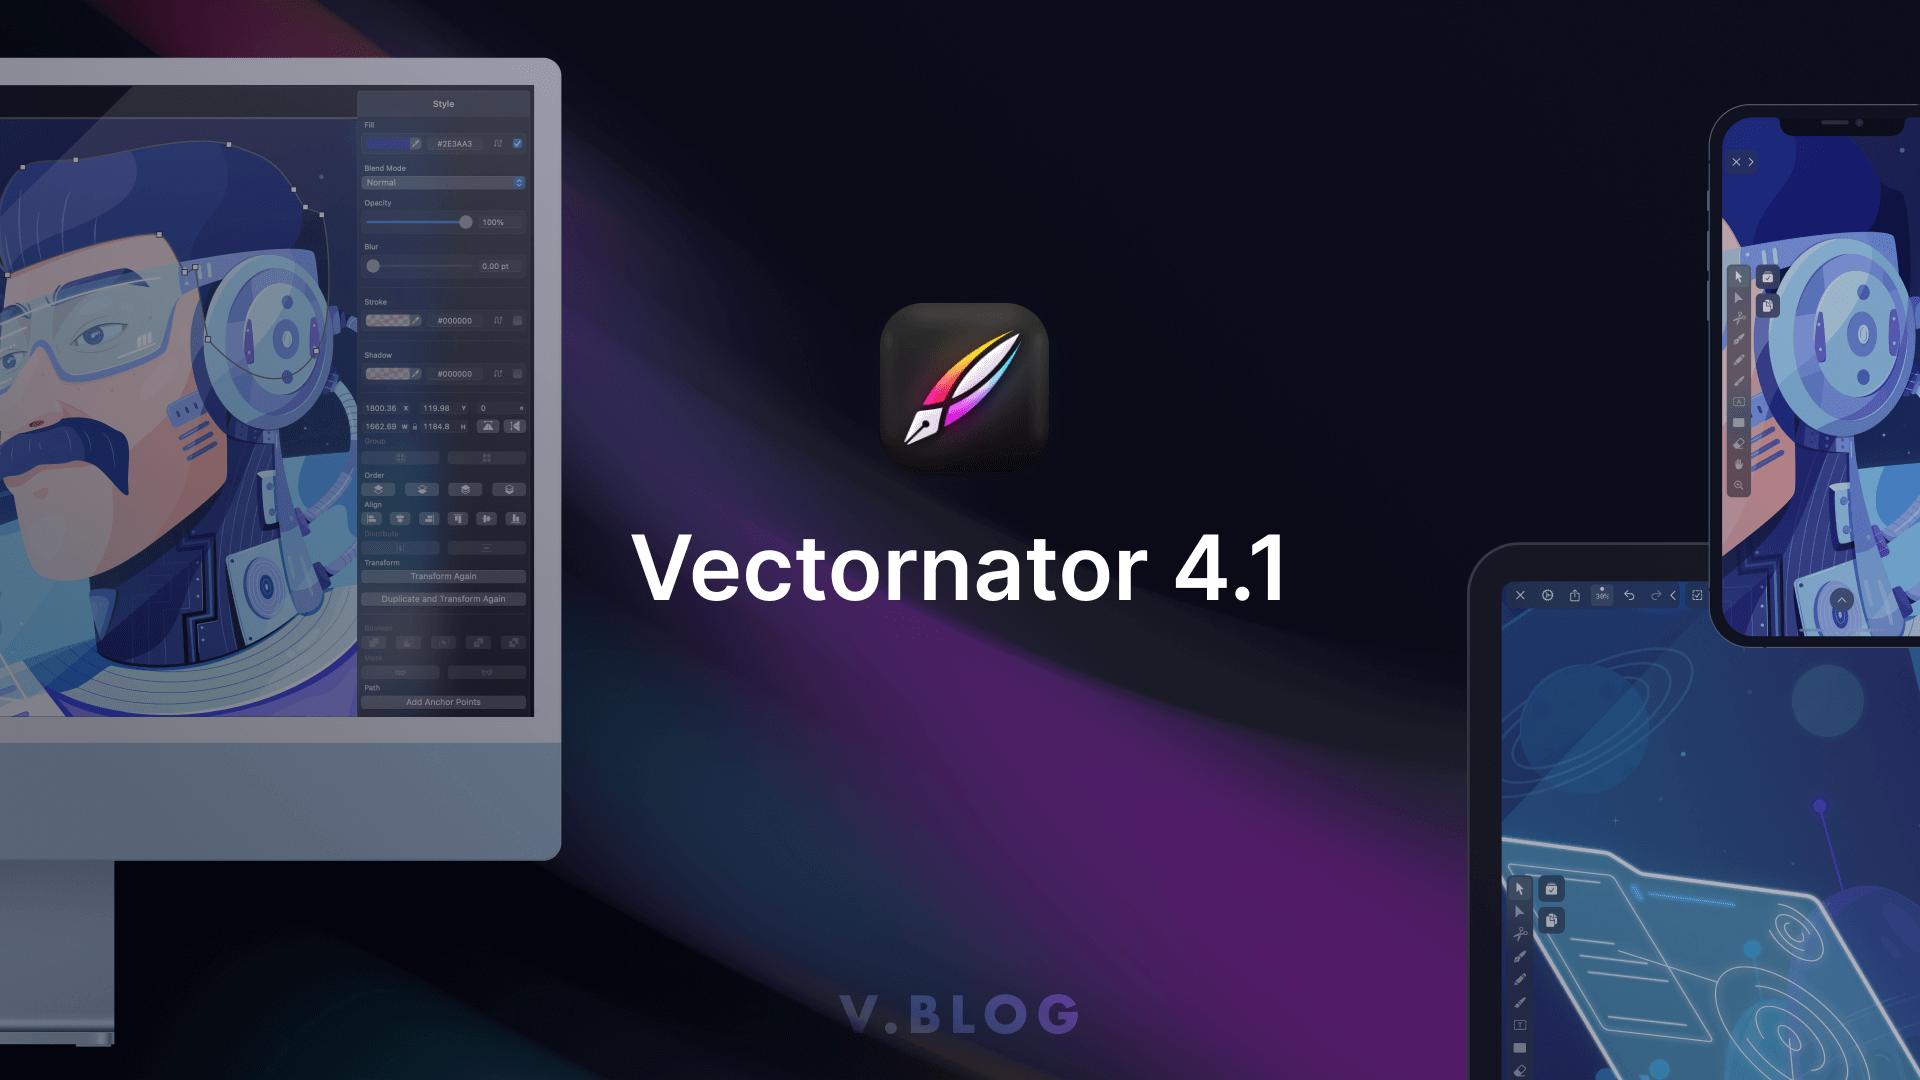 Vectornator 4.1